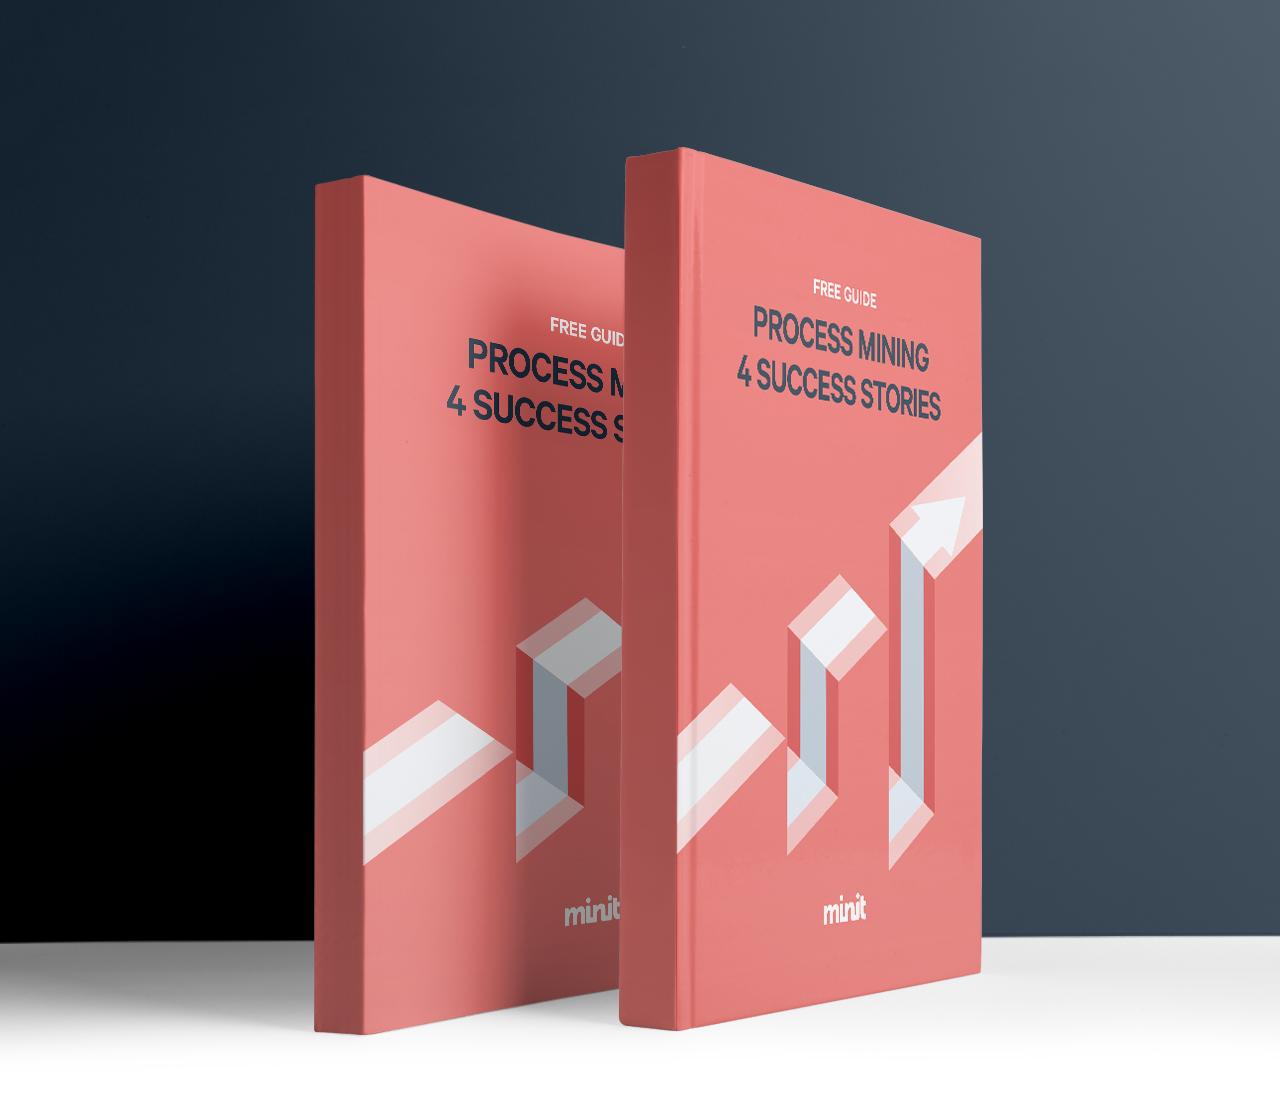 minit-process-mining-four-success-stories-ebook